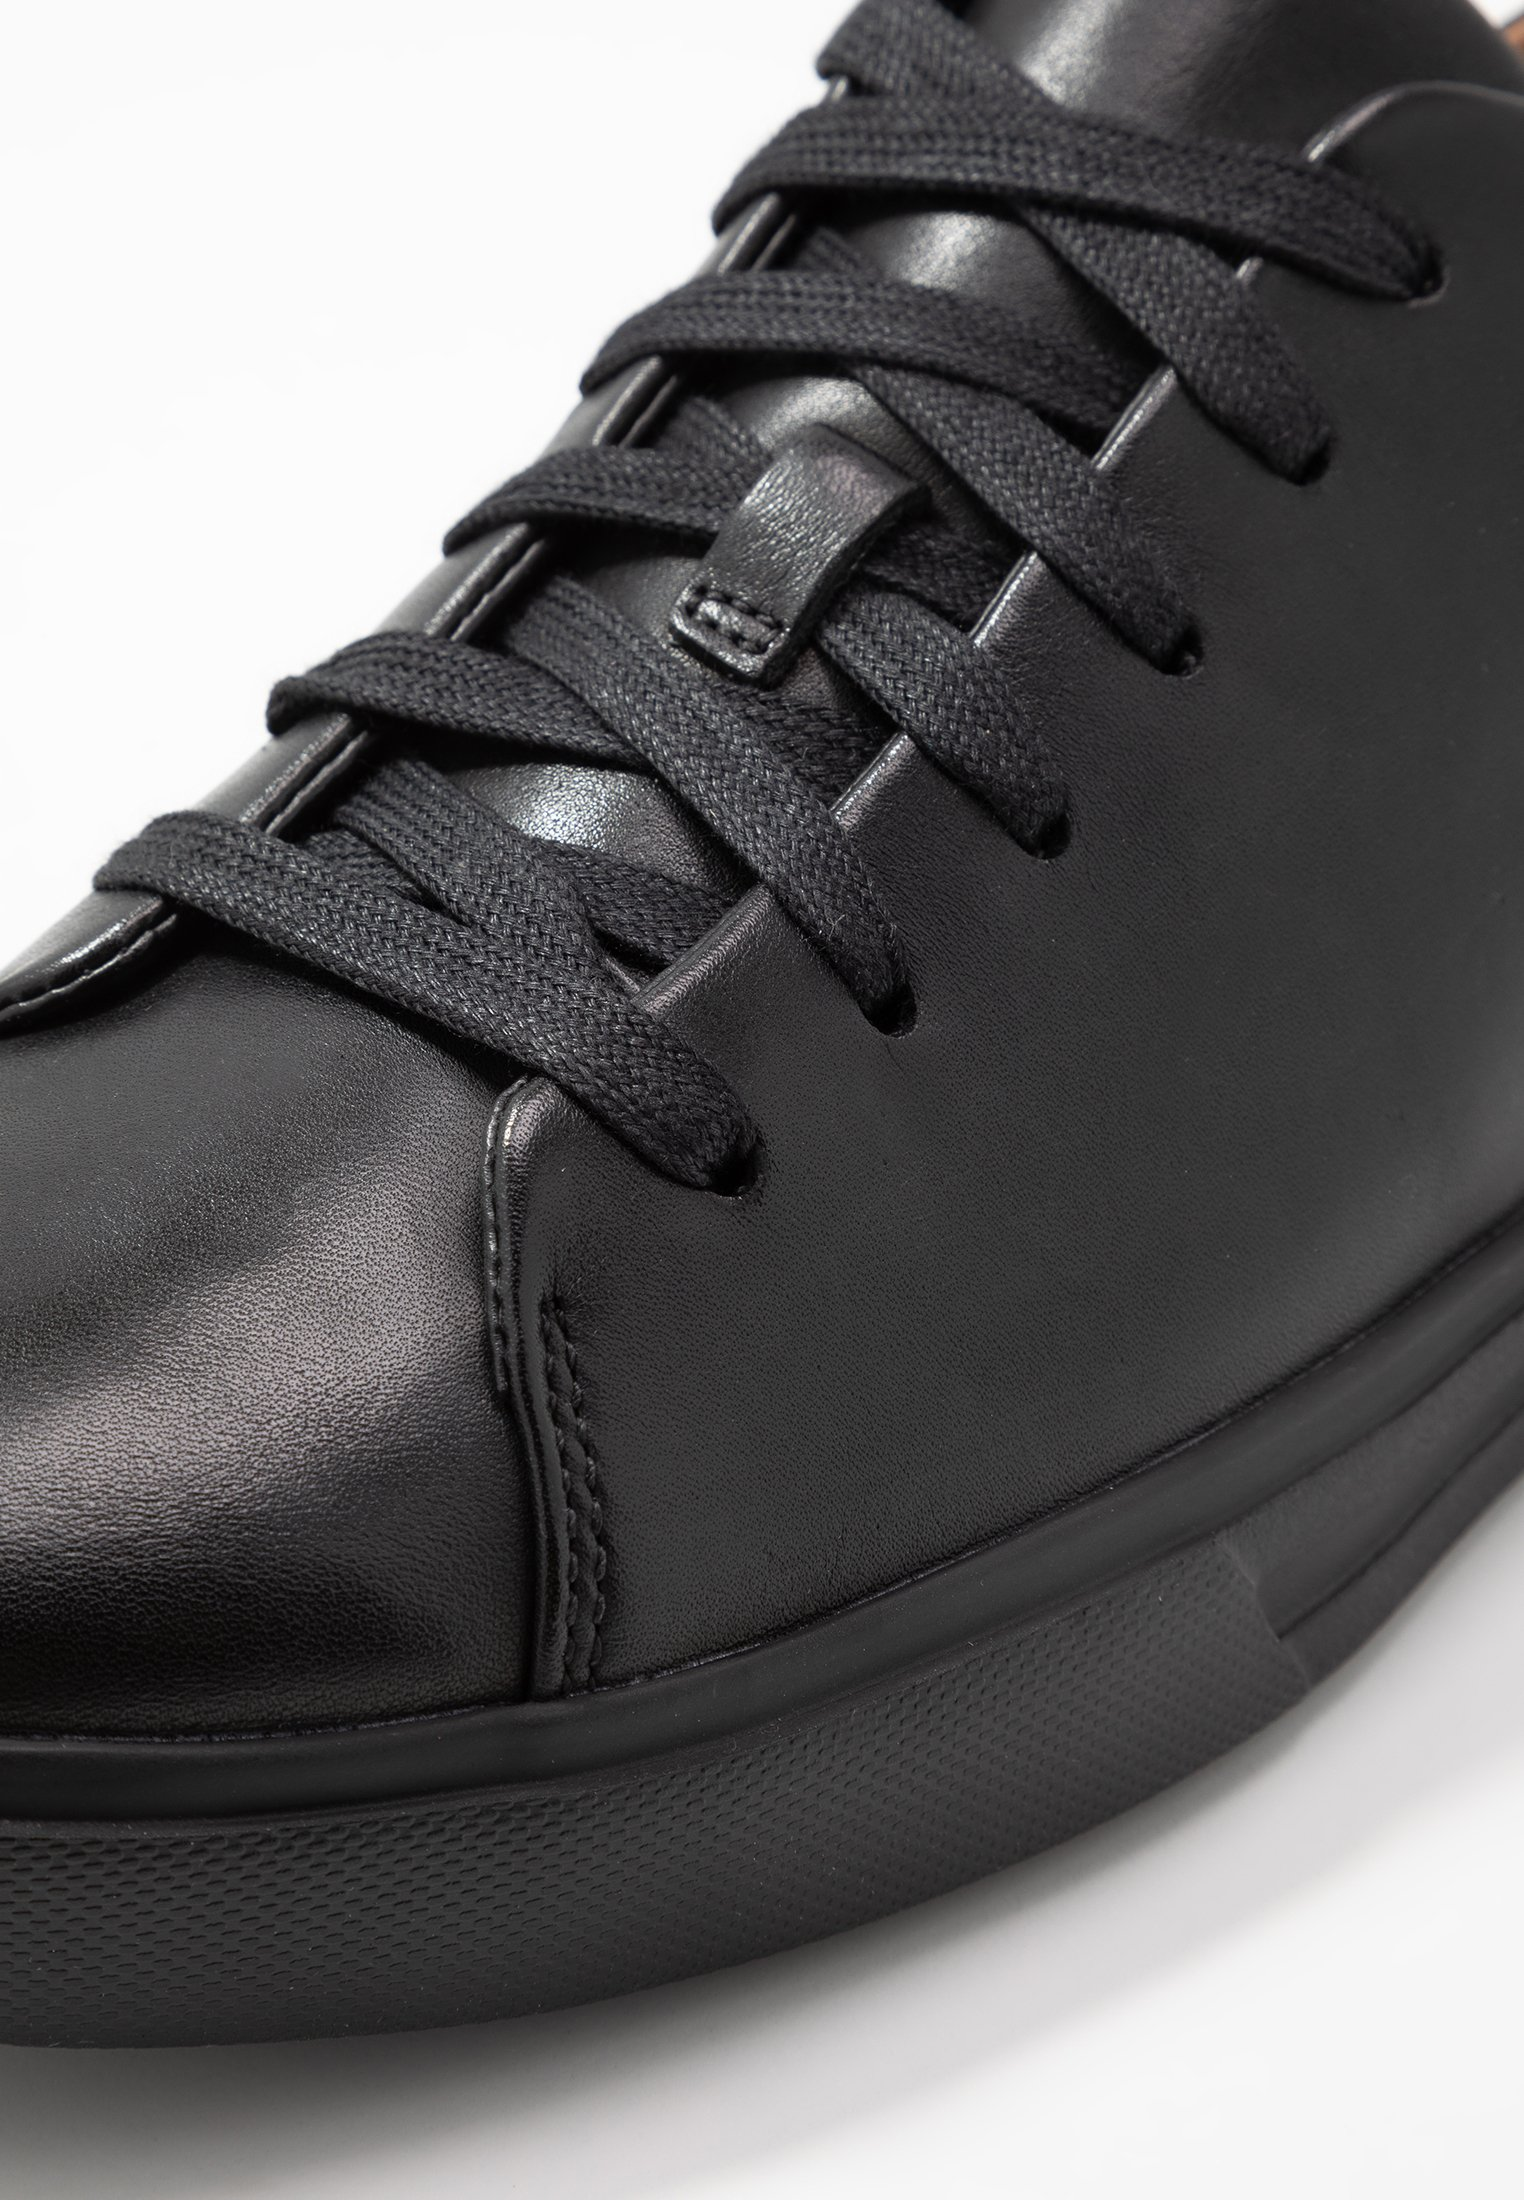 Clarks Un Costa Lace - Sneaker Low Black Friday